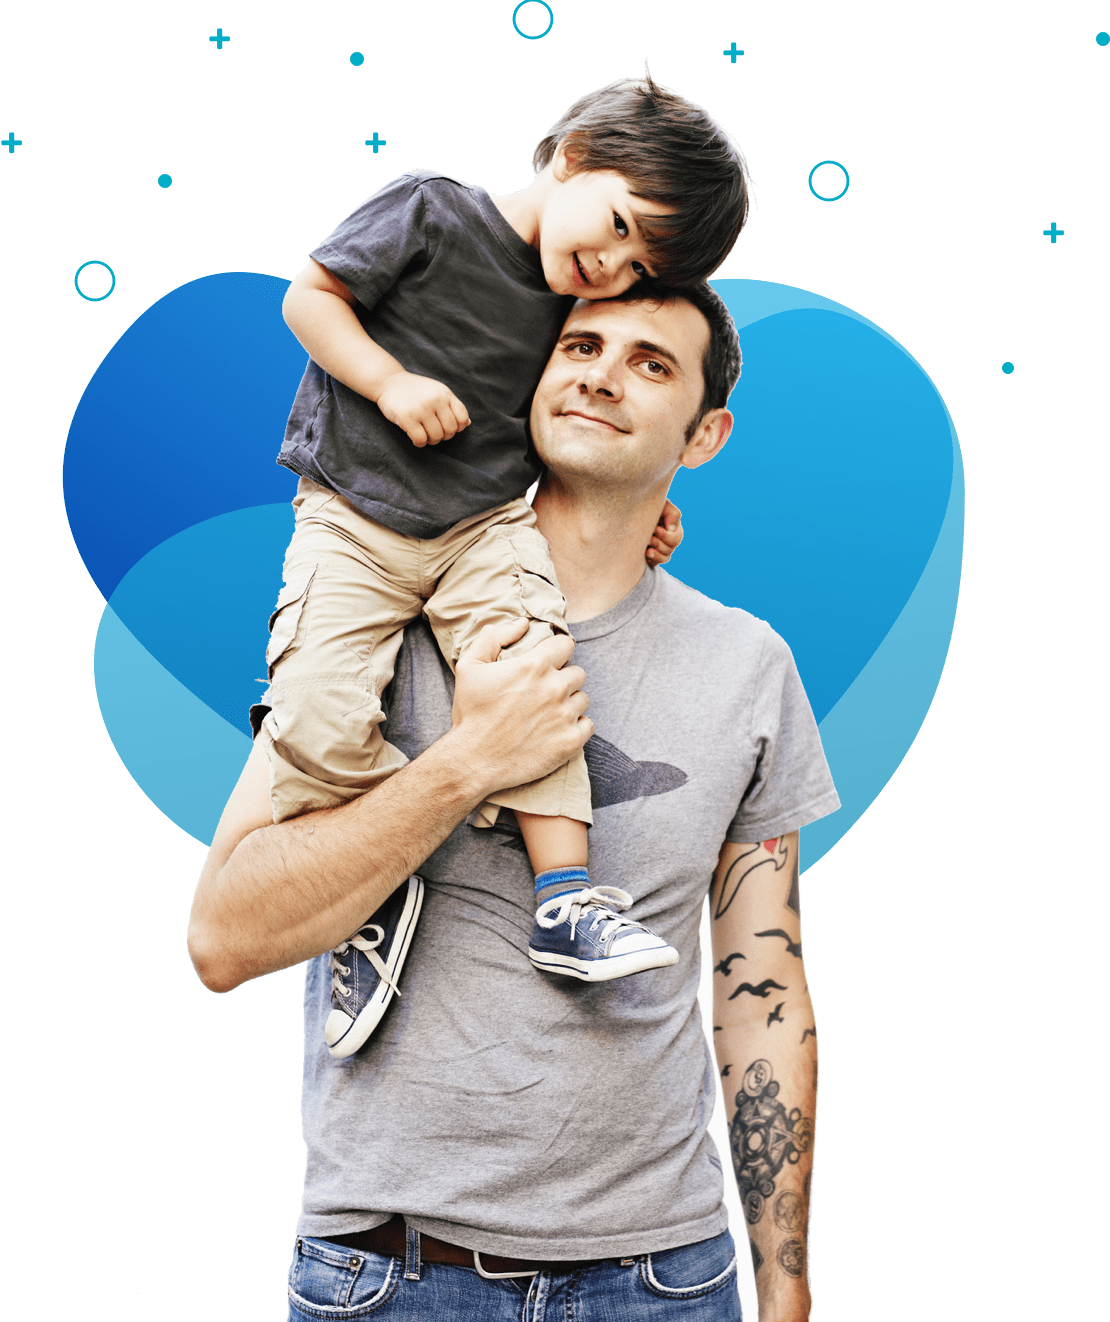 imagen padre e hija